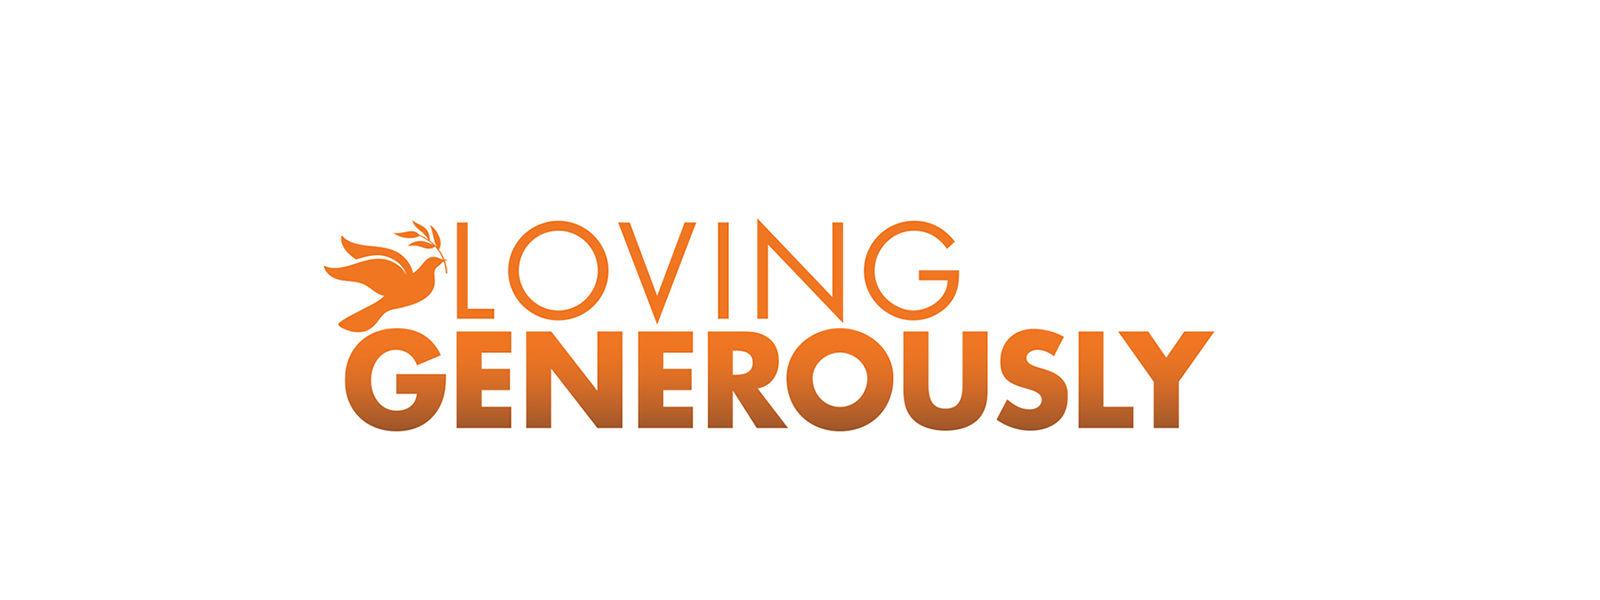 Loving Generously